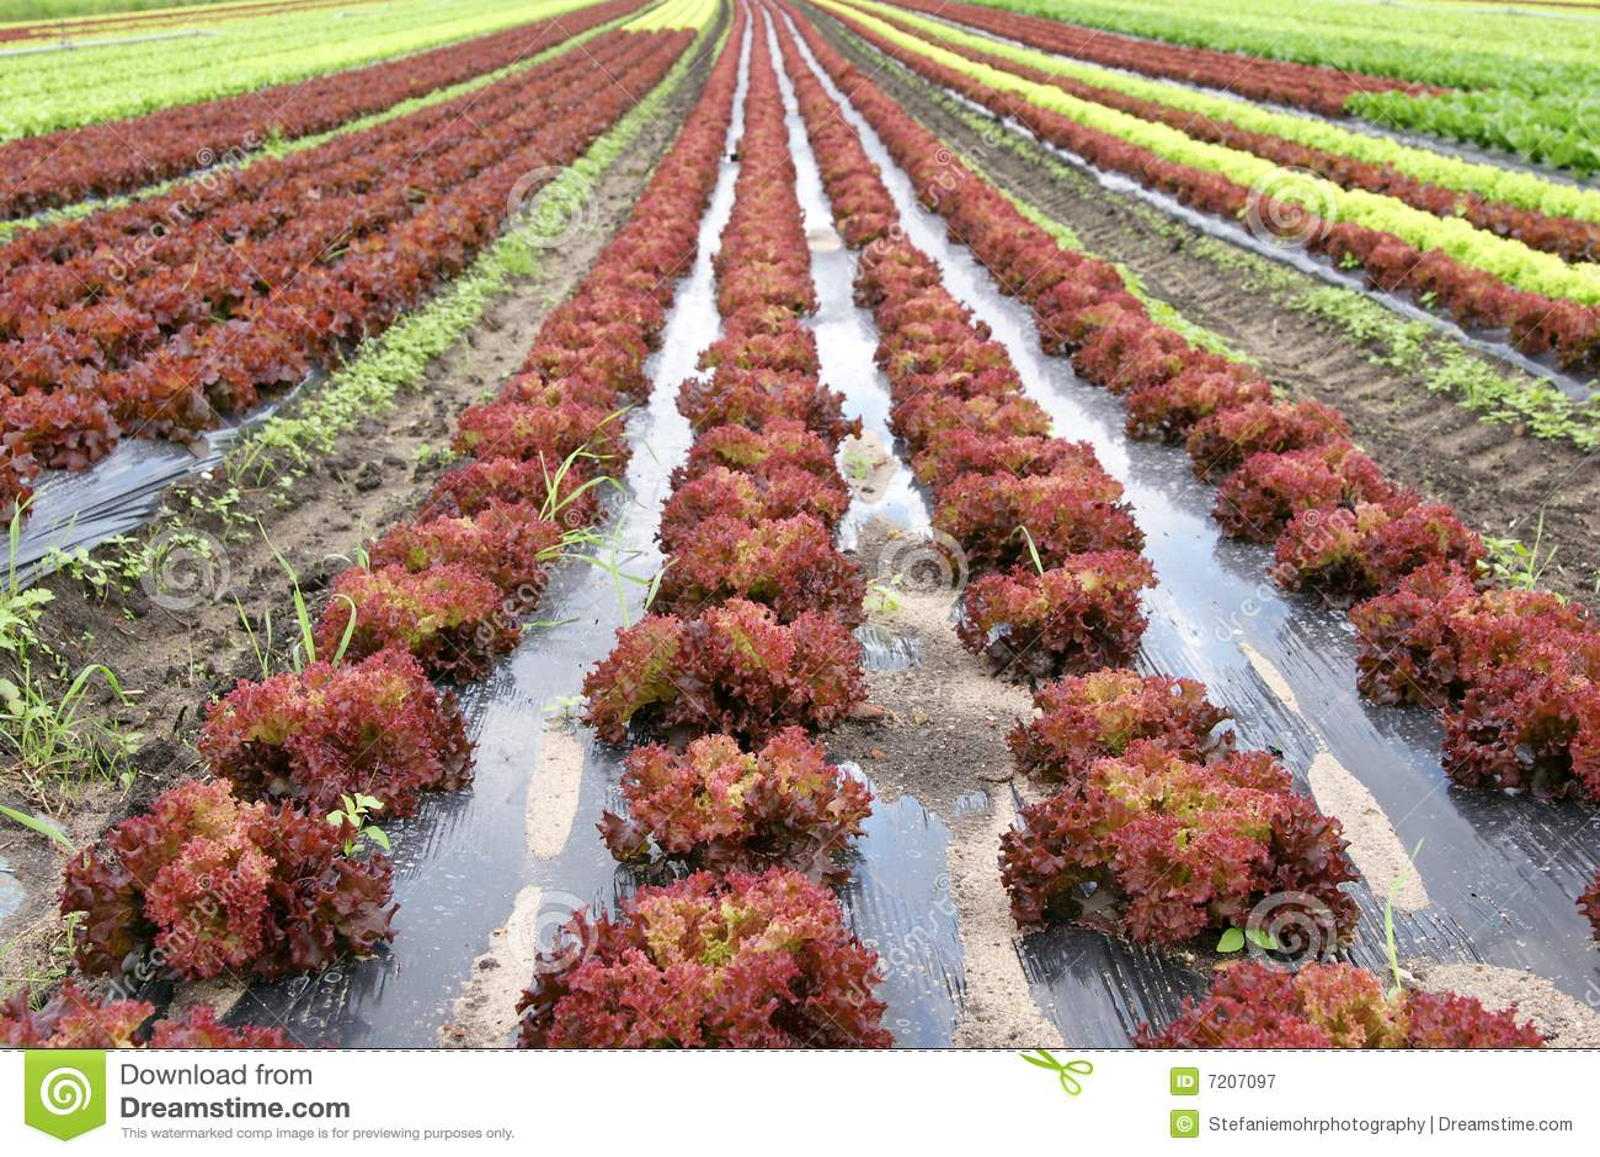 lollo rosso salat lizenzfreie stockfotografie bild 7207097. Black Bedroom Furniture Sets. Home Design Ideas